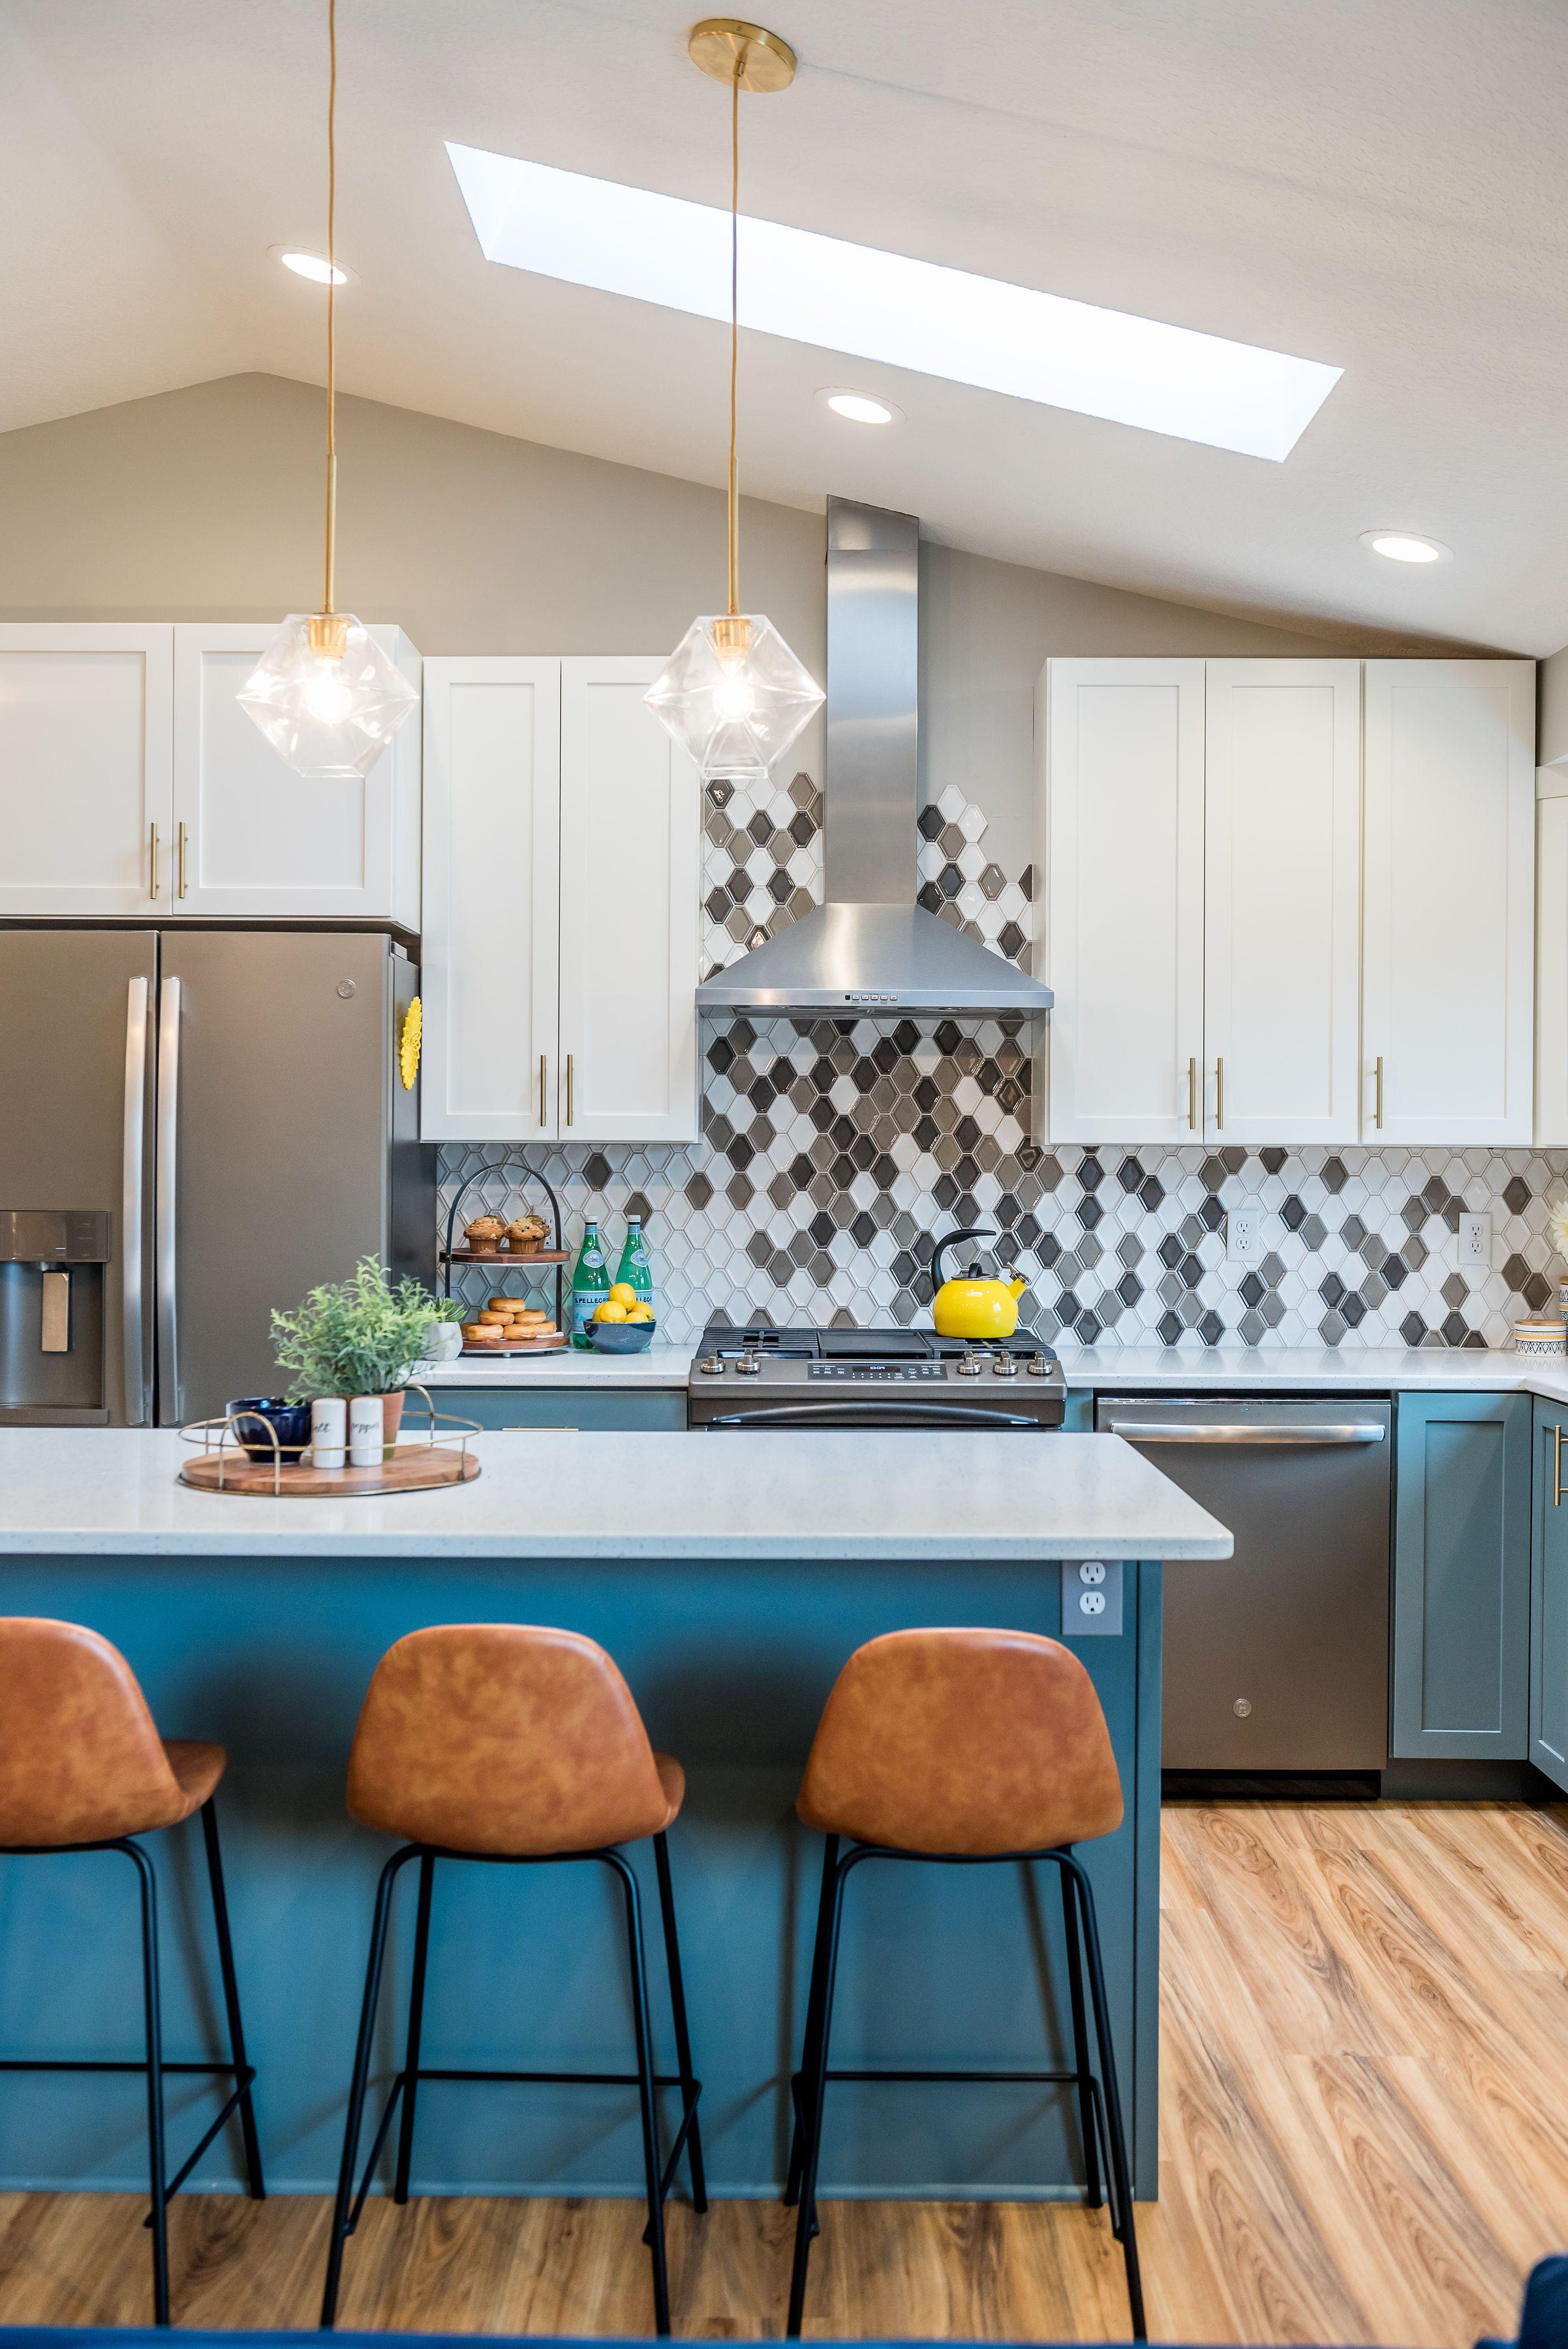 mid century modern style kitchen tiles design kitchen trends small kitchen redo on kitchen decor trends id=64291